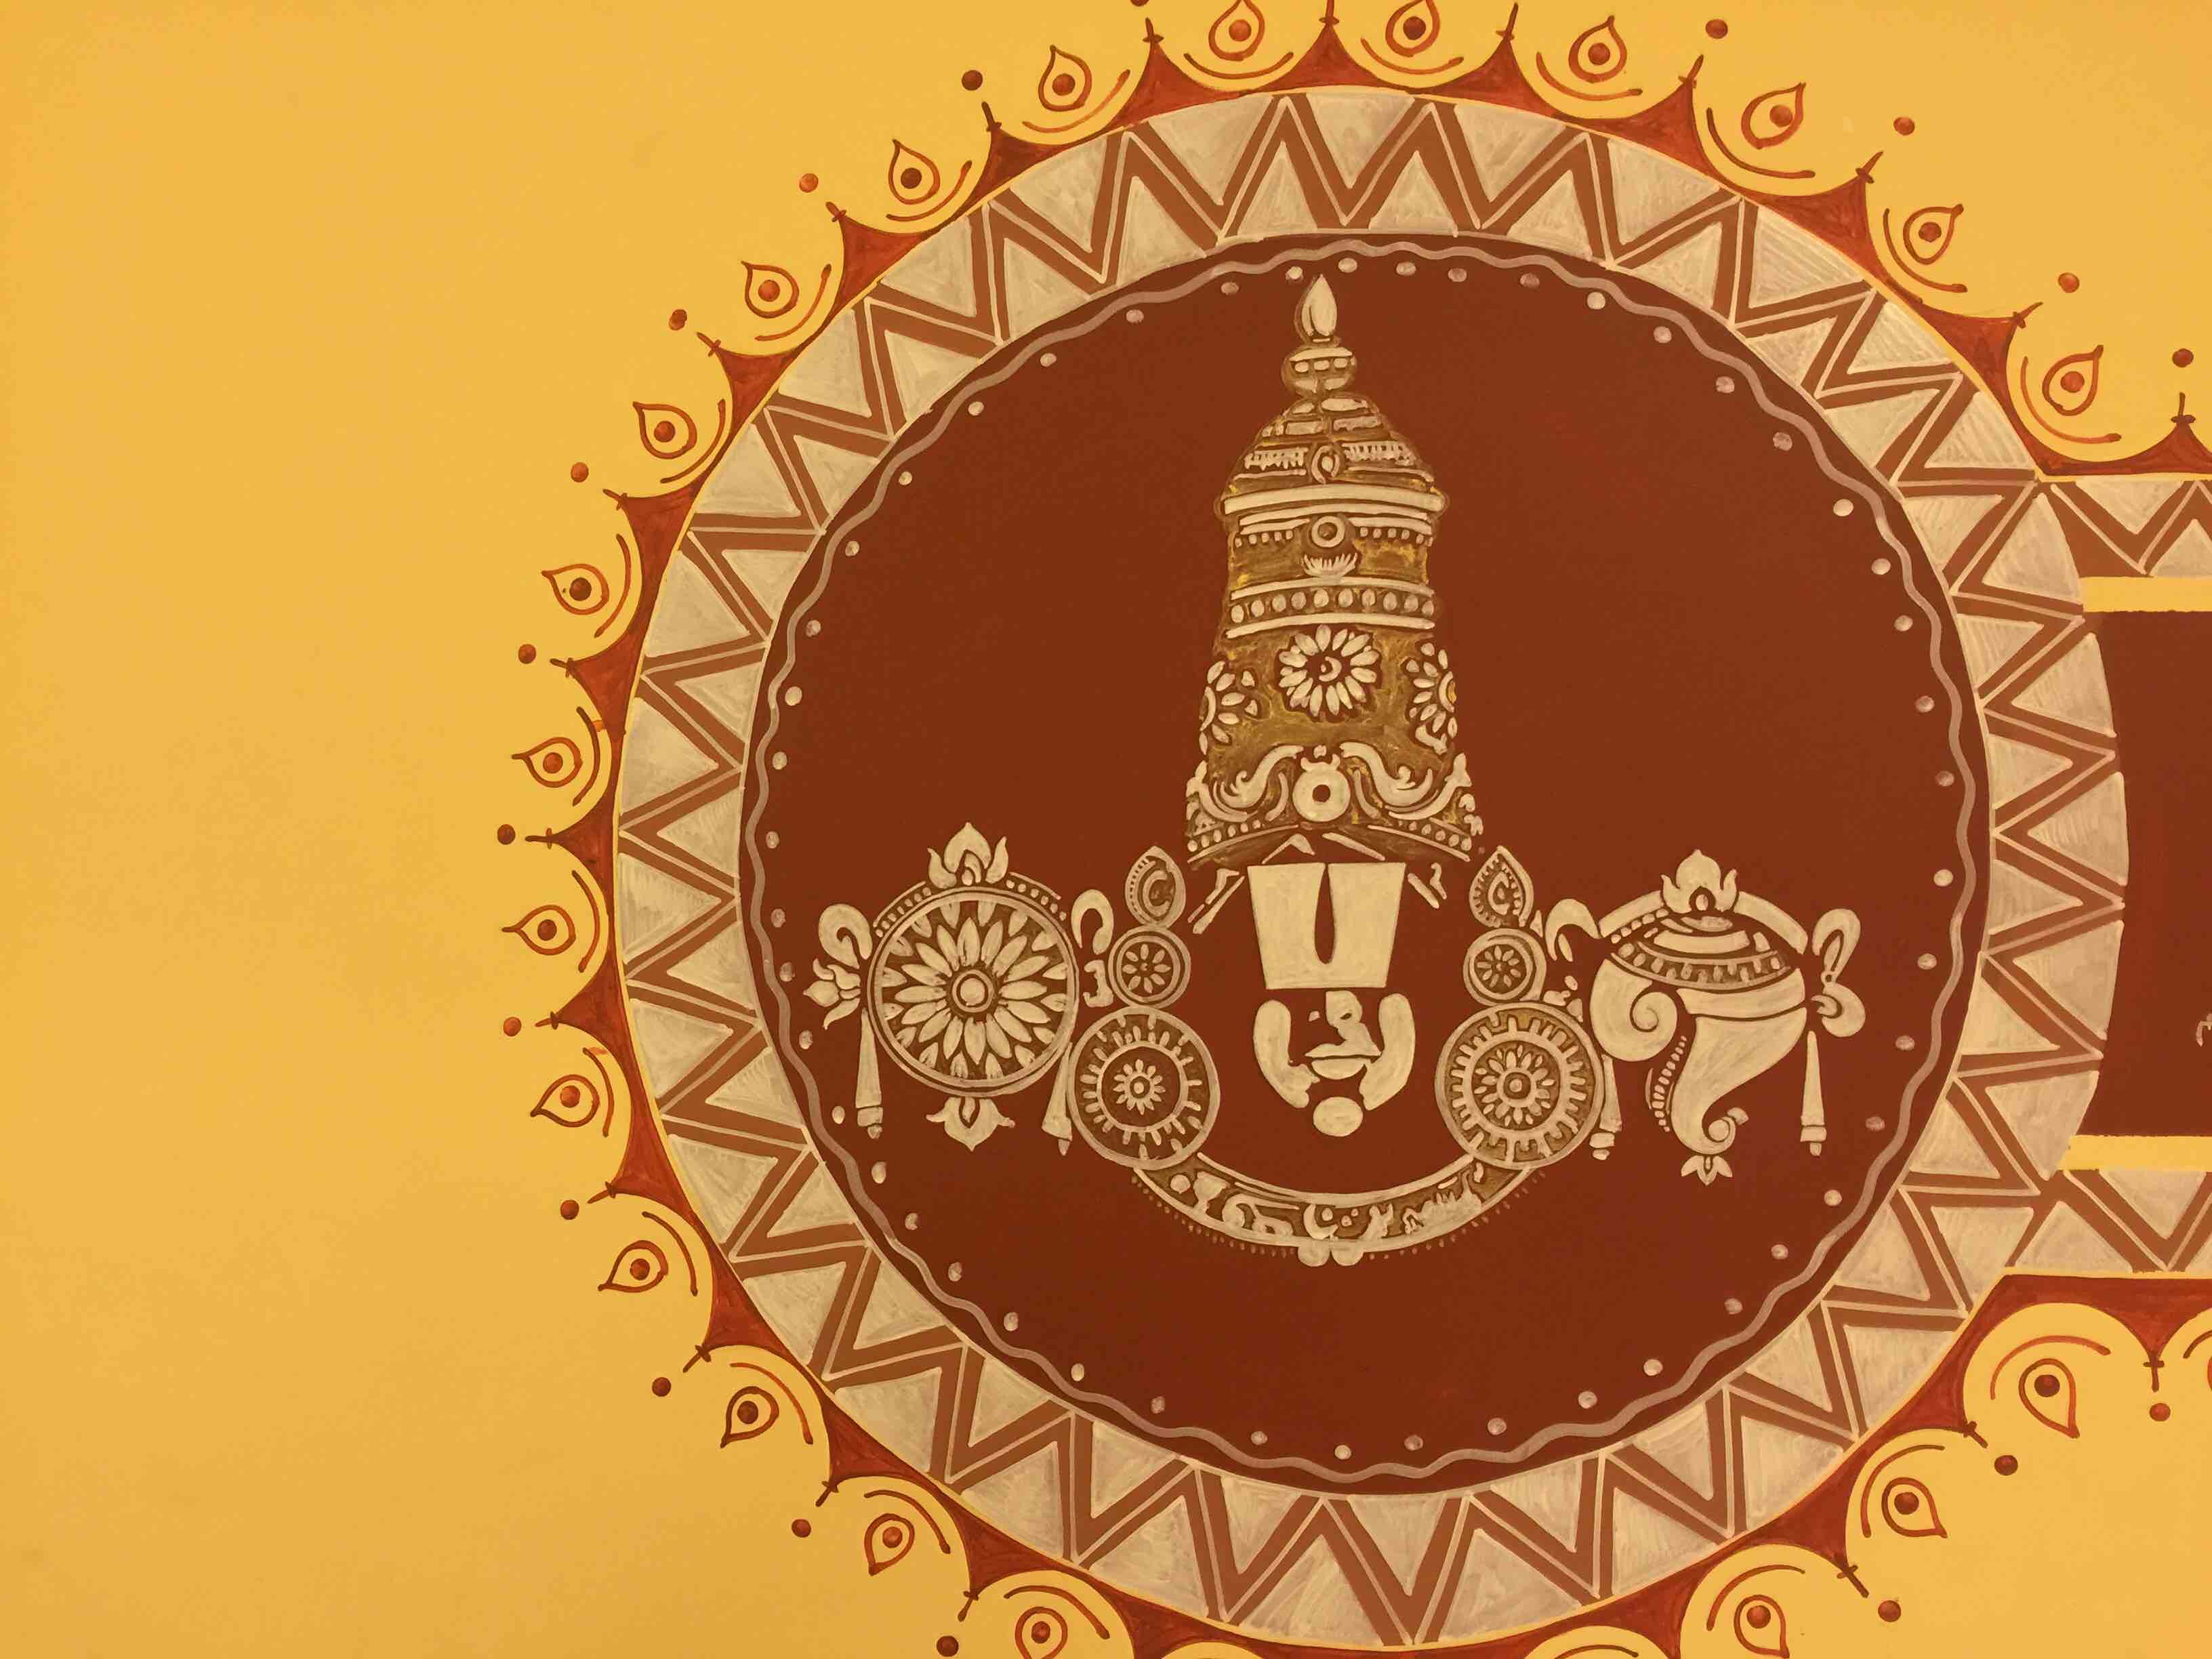 Govindappa donne briyani